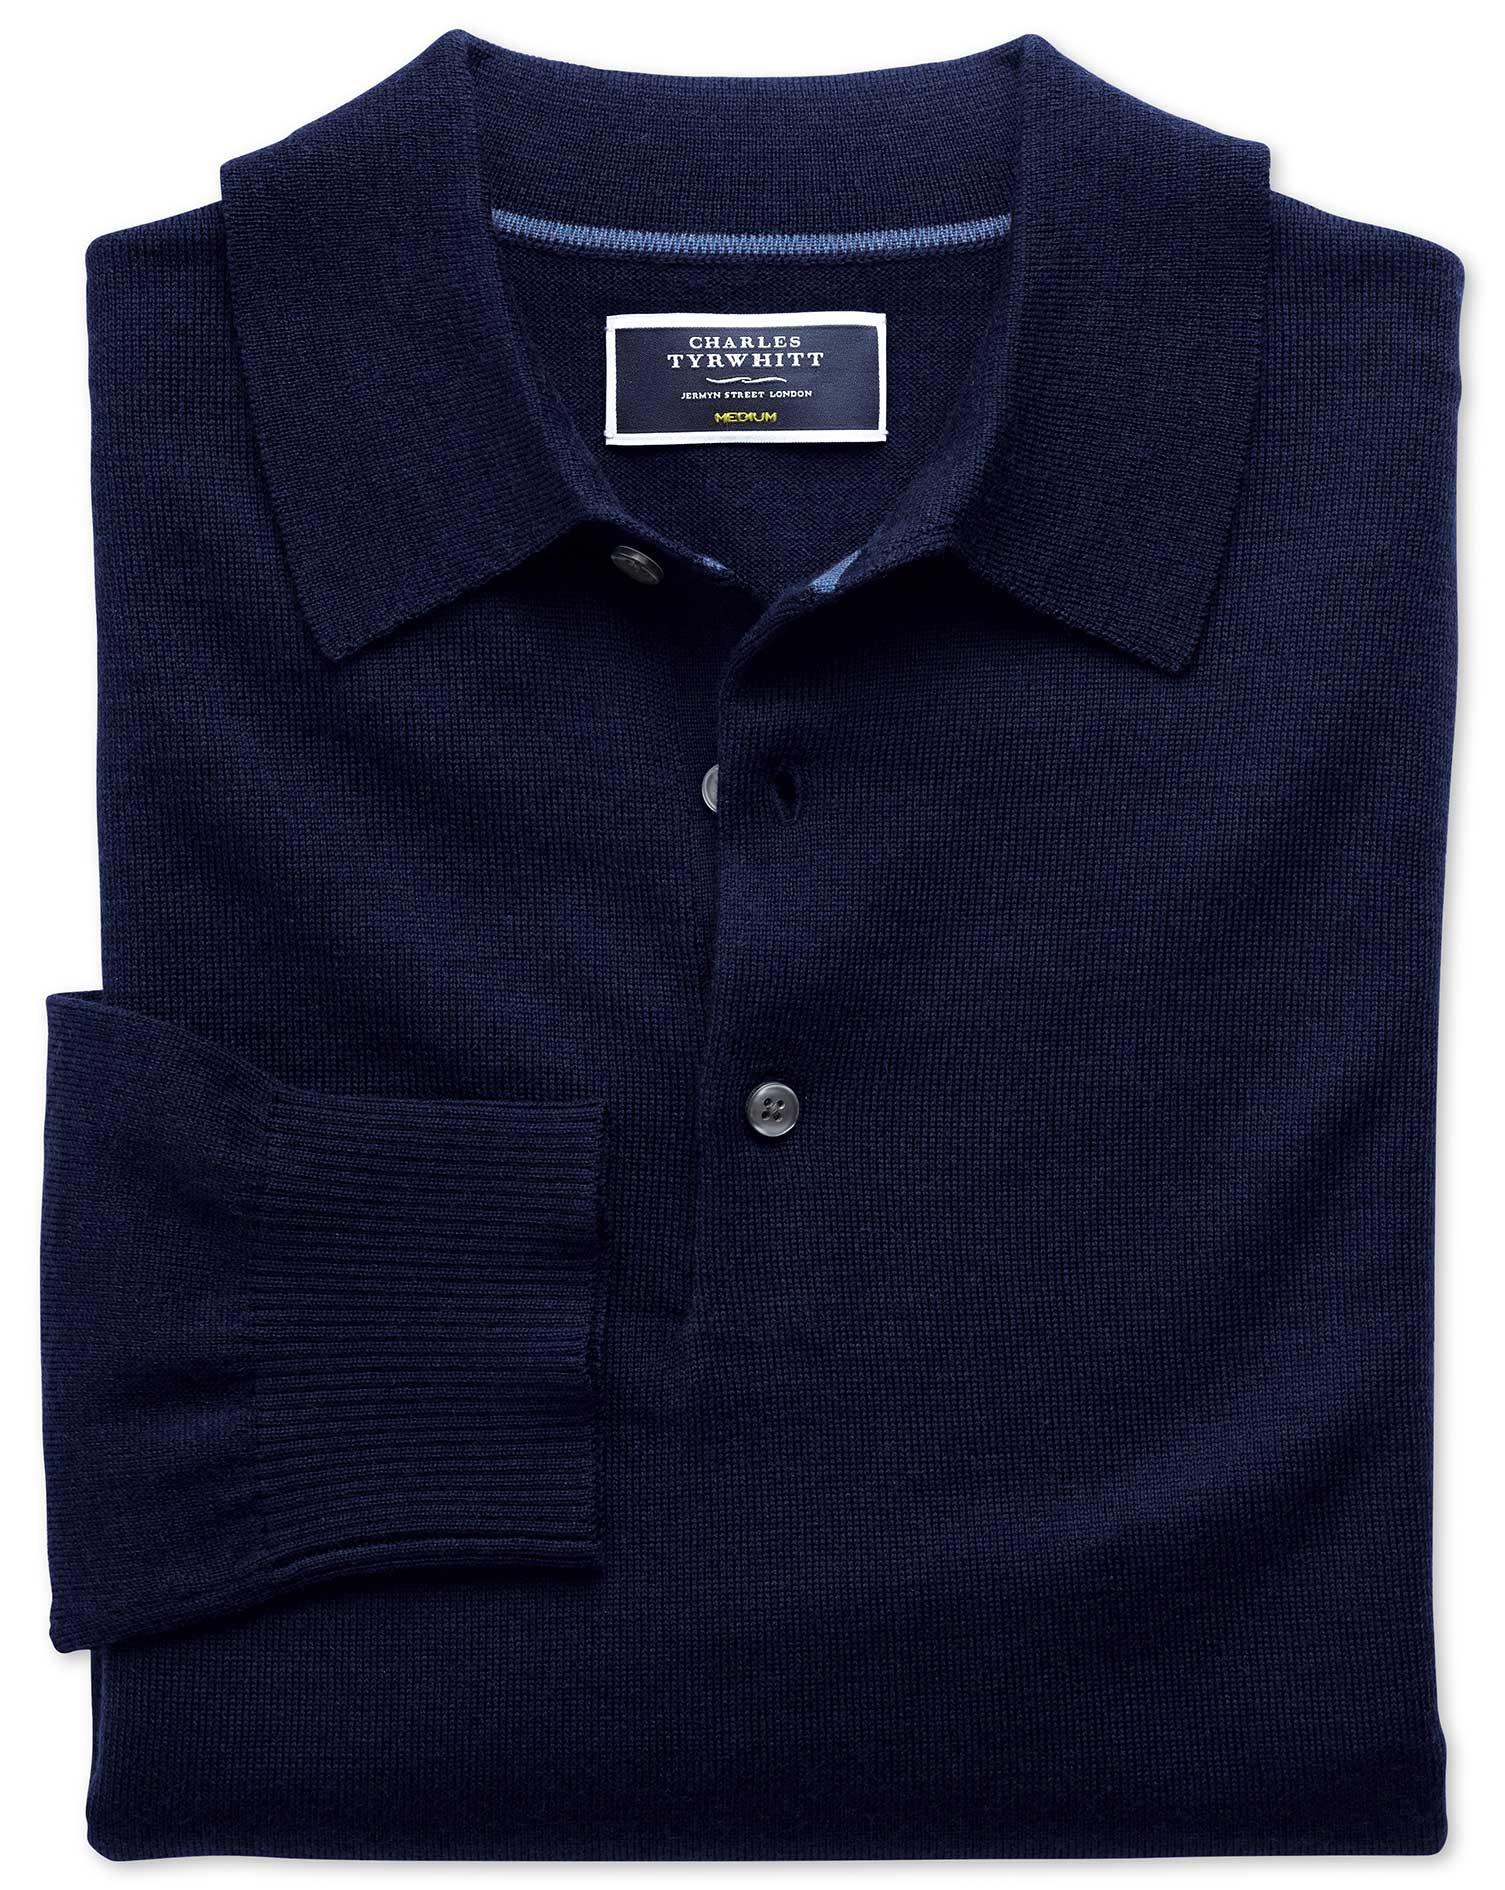 Navy Merino Wool Polo Neck Jumper Size XL by Charles Tyrwhitt